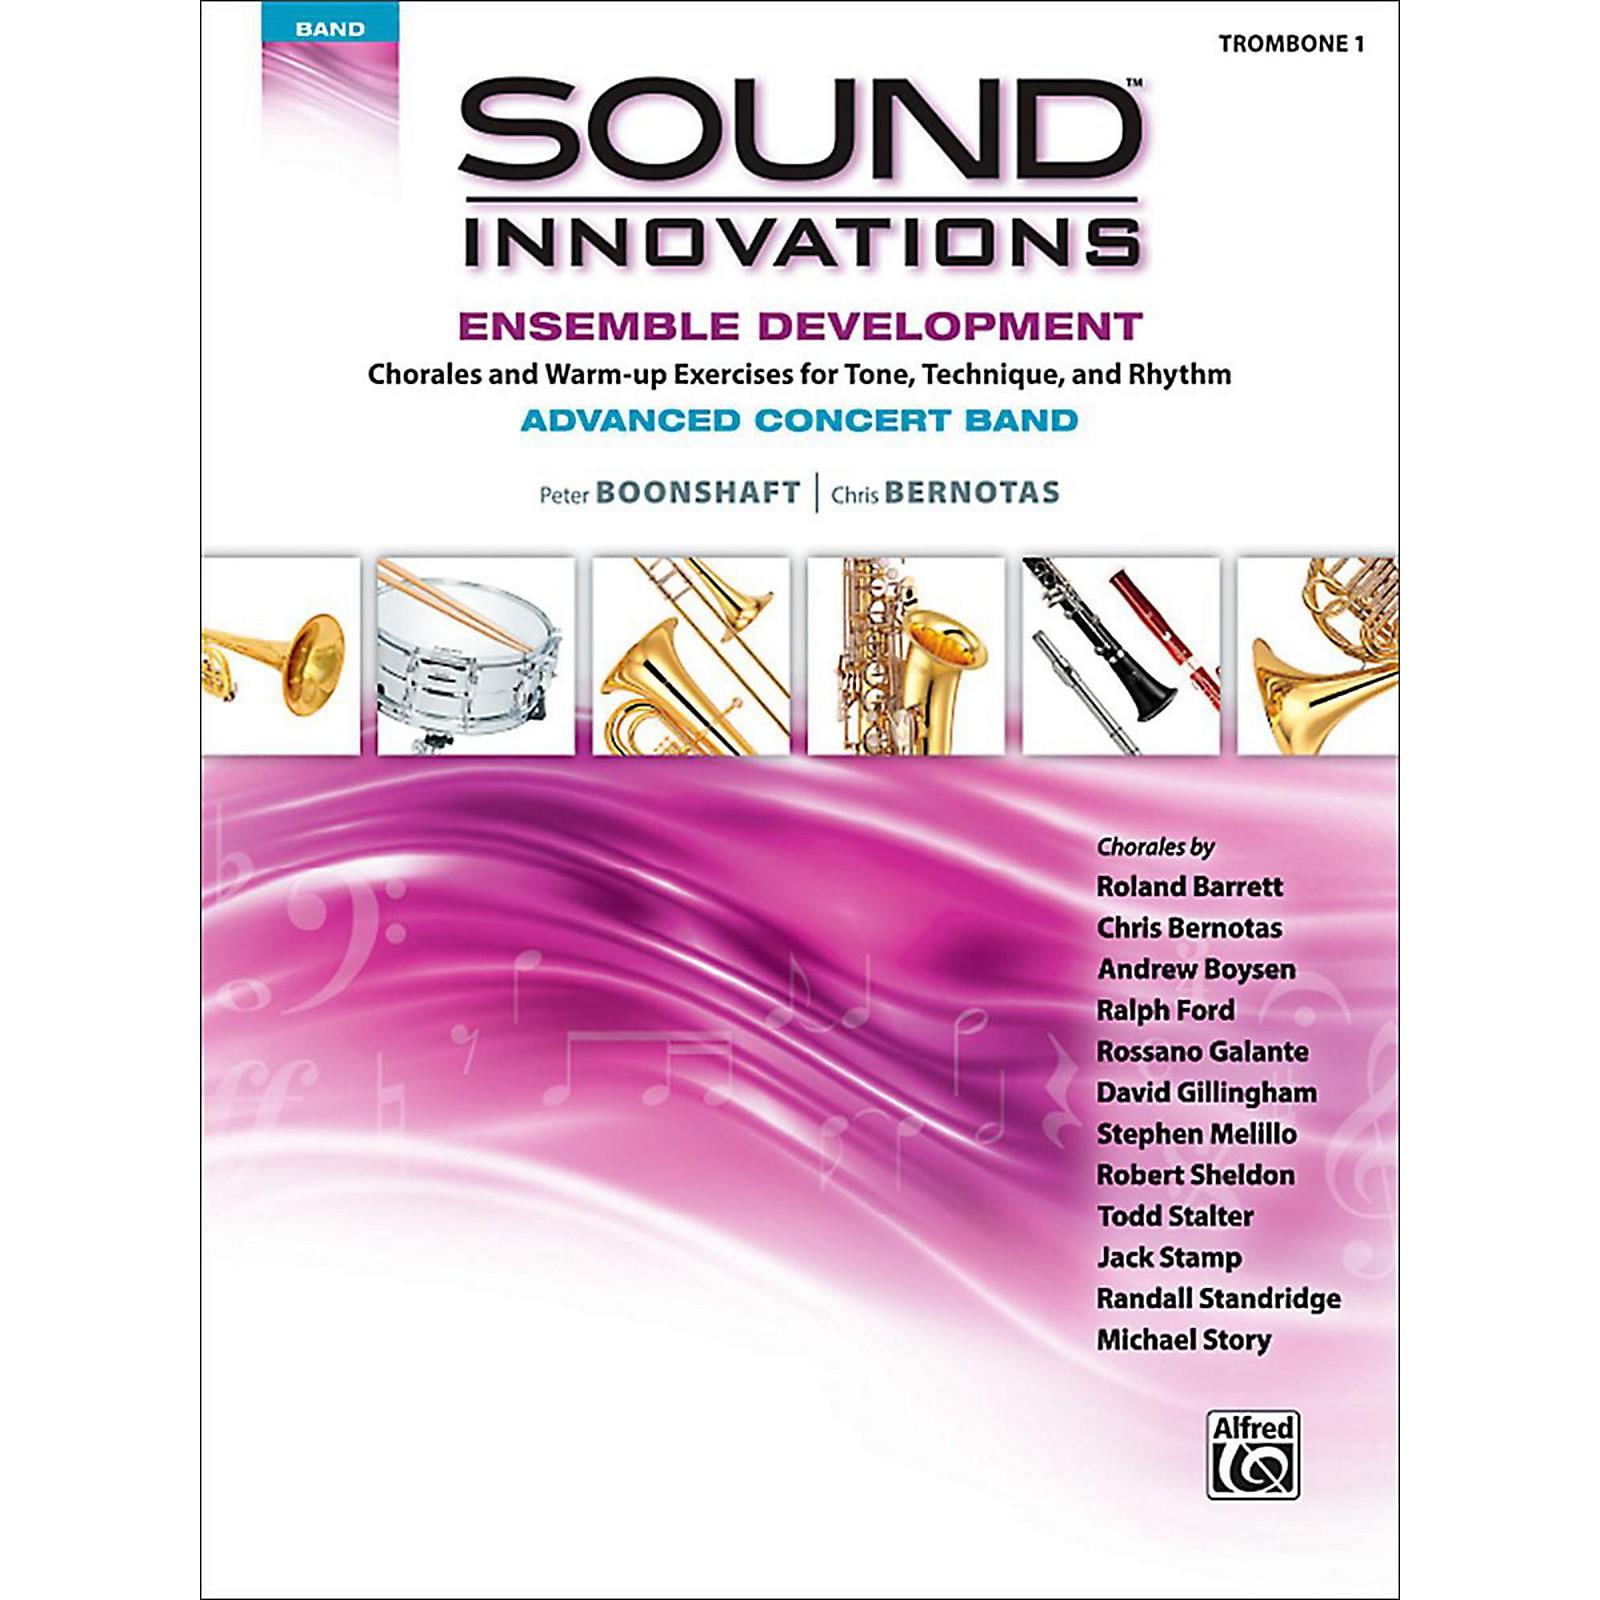 Alfred Sound Innovations Concert Band Ensemble Development Advanced Trombone 1